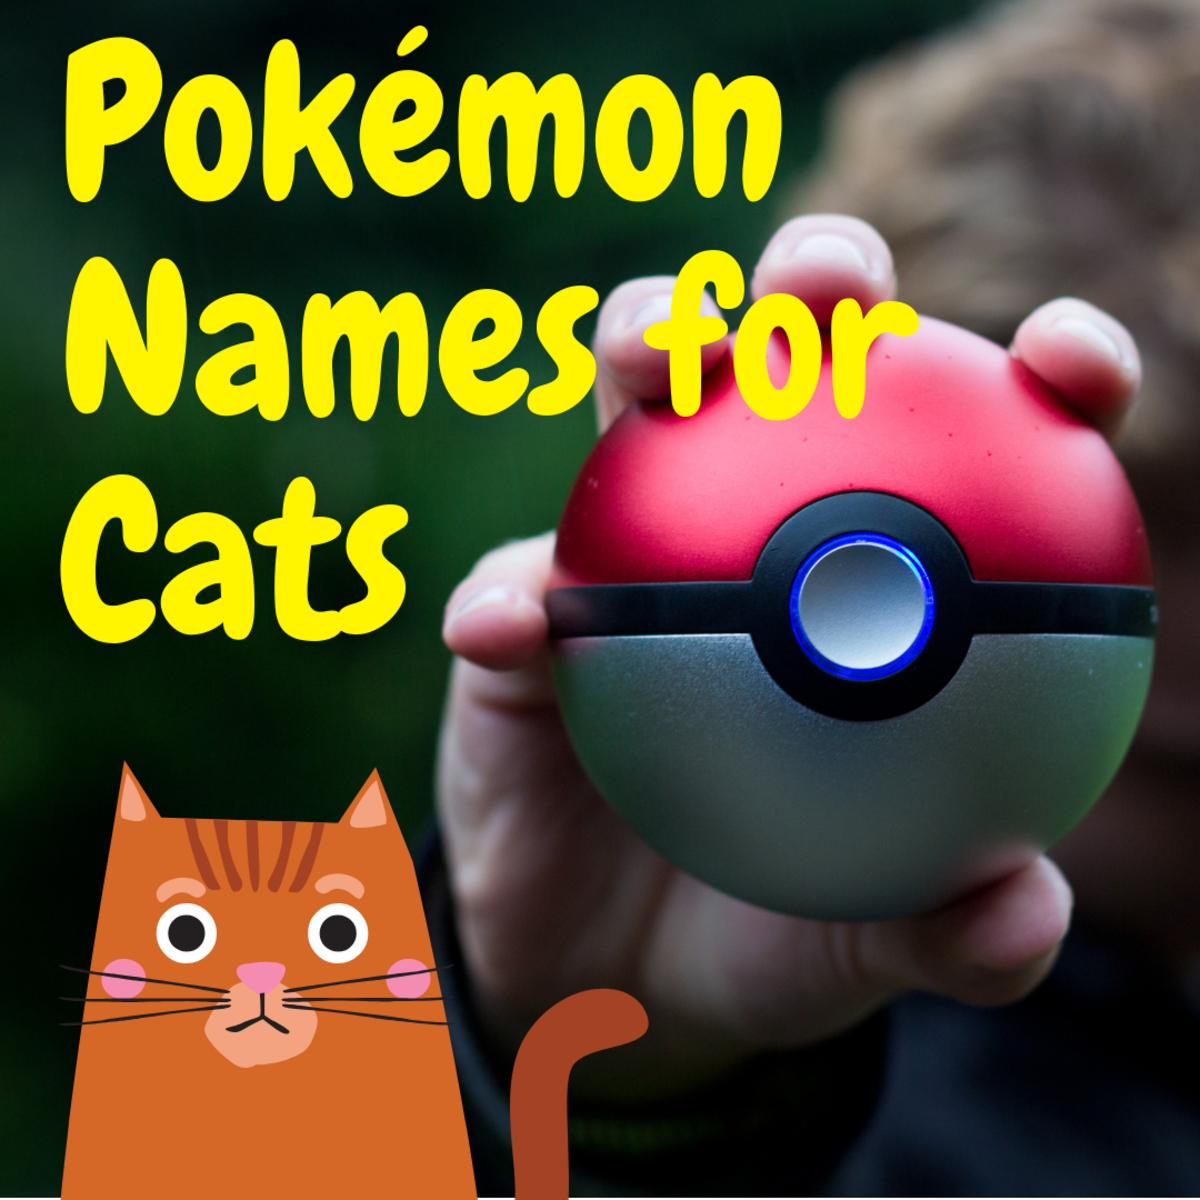 150 Pokémon Cat Names With Nicknames